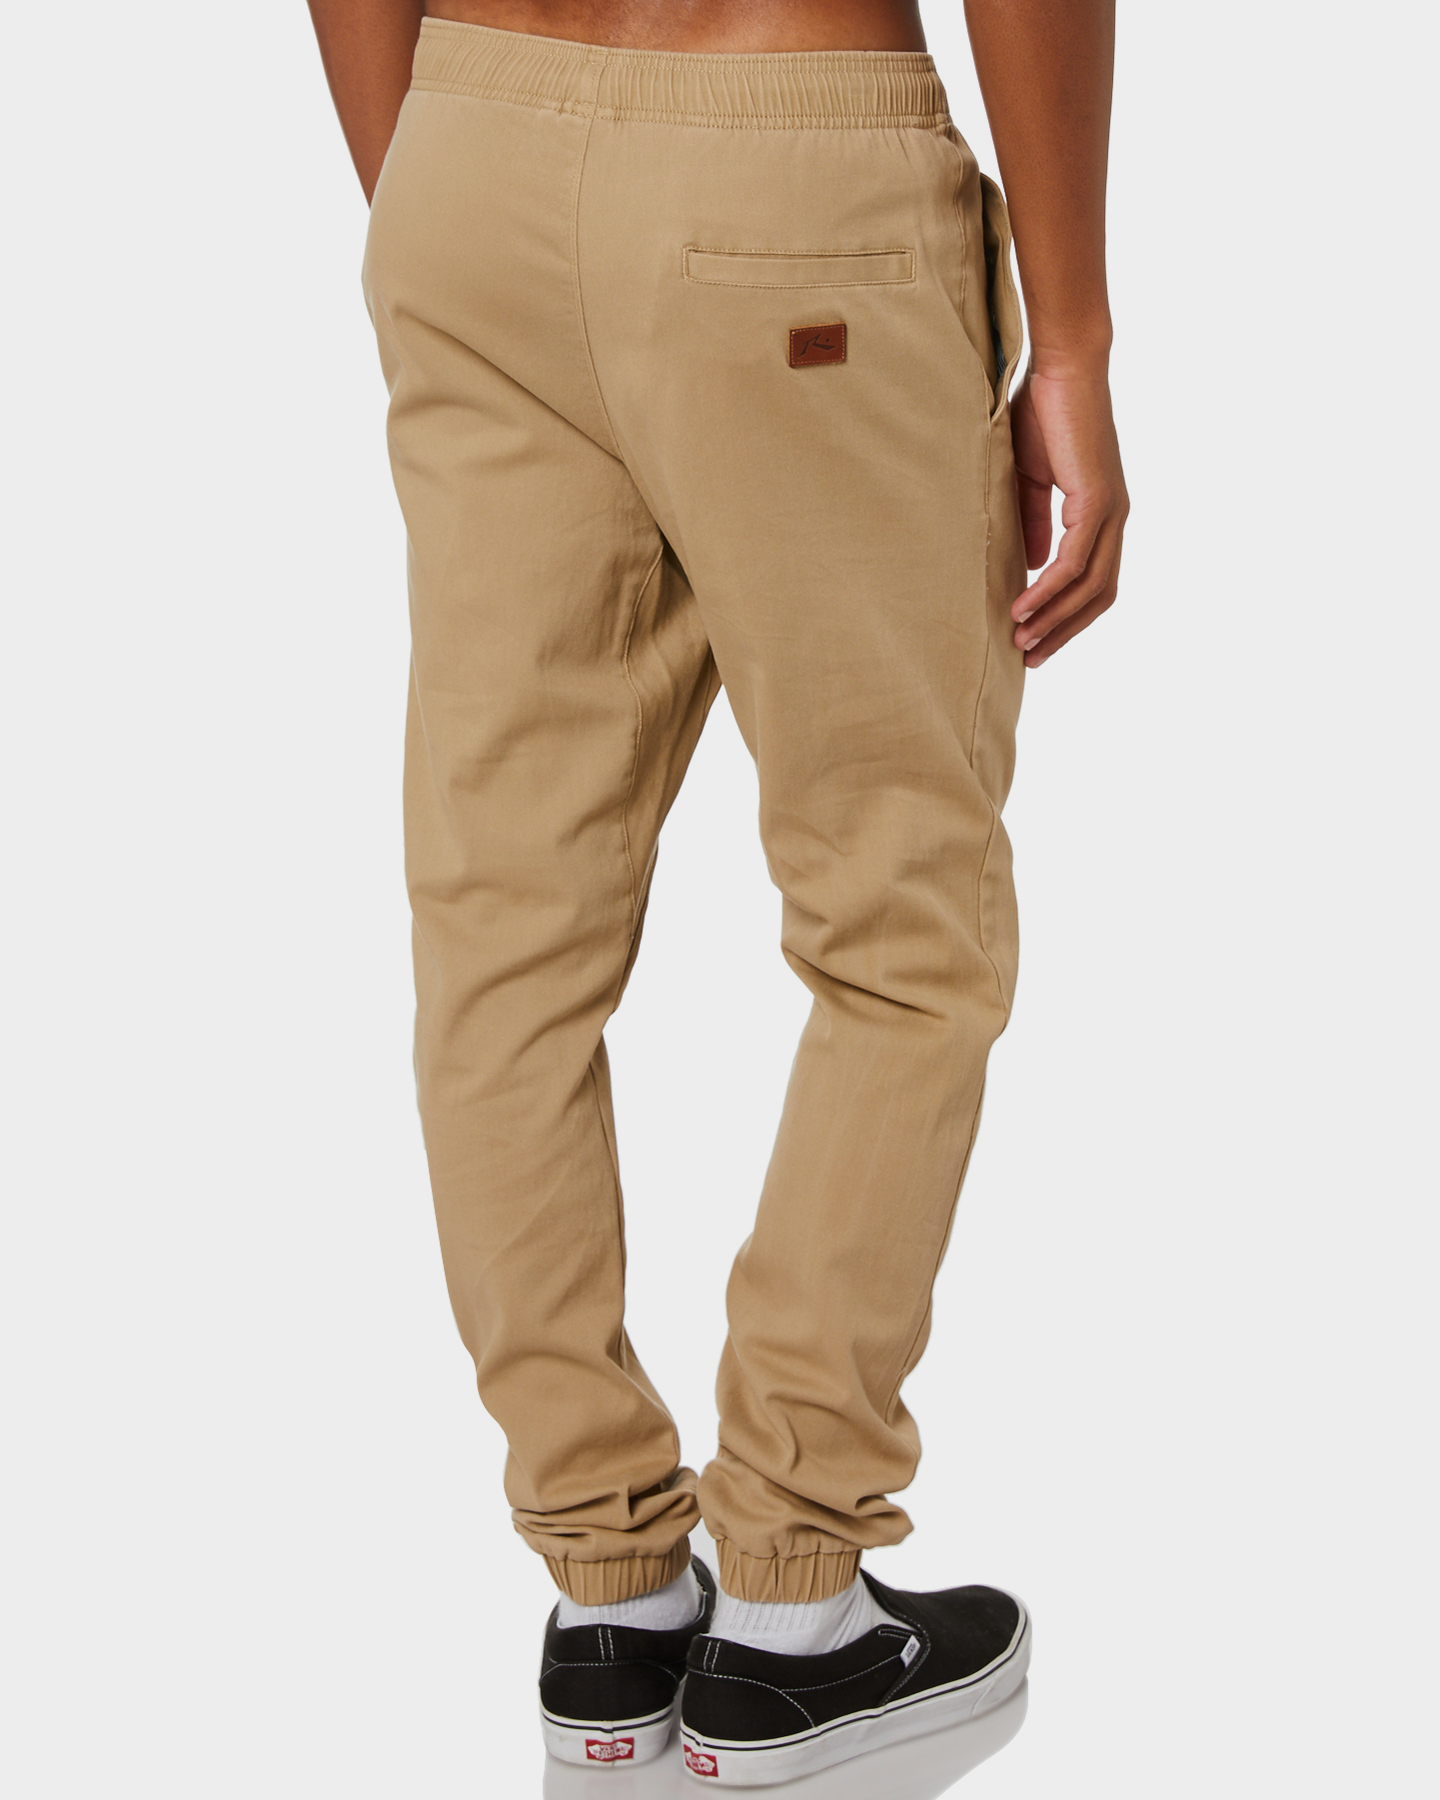 New-Rusty-Men-039-s-Hook-Out-Mens-Jogger-Pant-Cotton-Spandex-Blue thumbnail 19